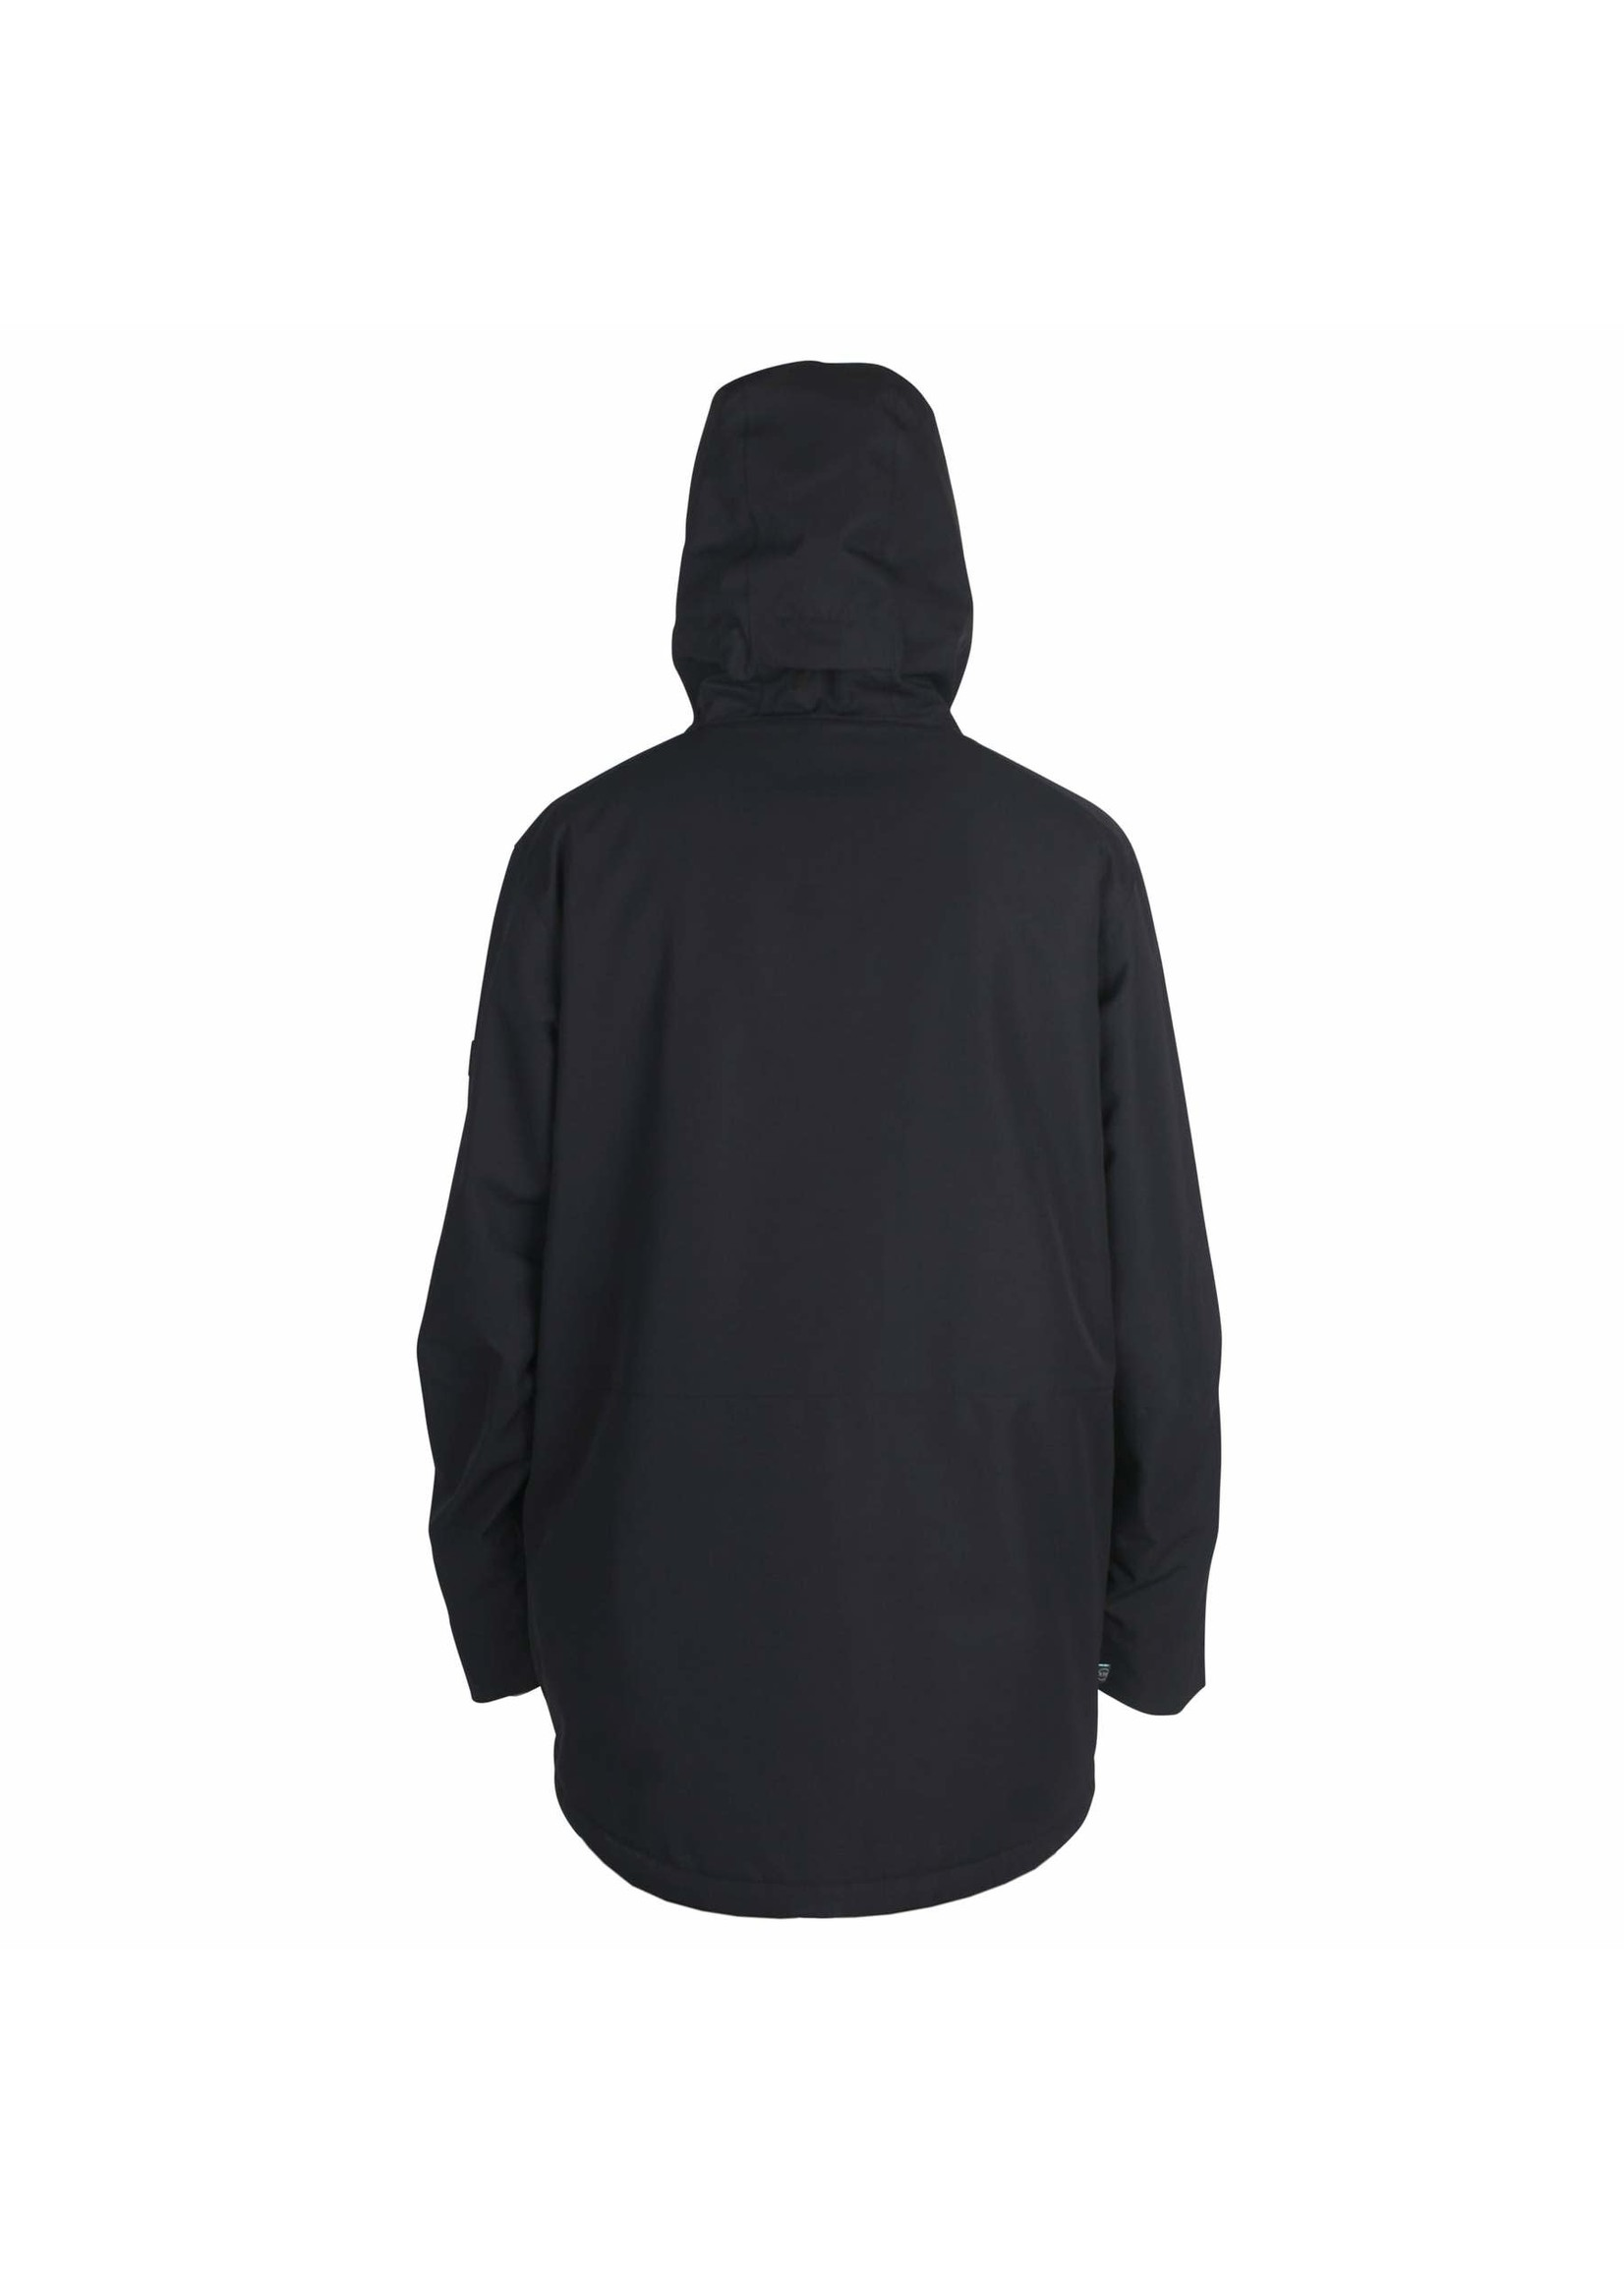 Ride Pinehurst Jacket